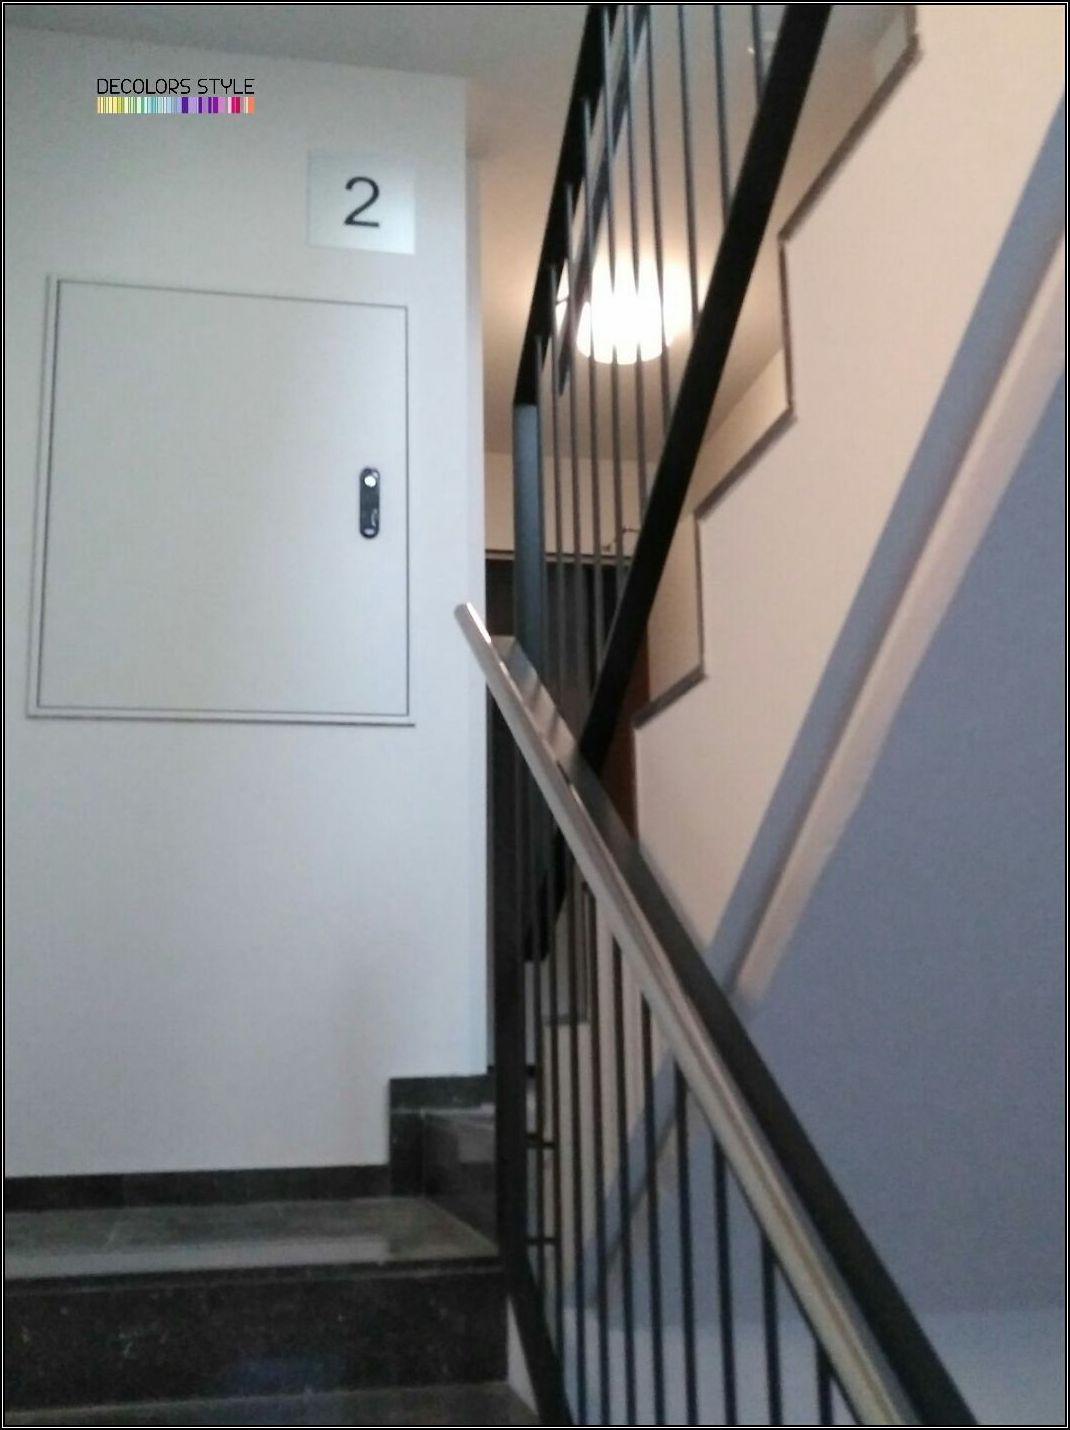 Interior de escalera comunitaria